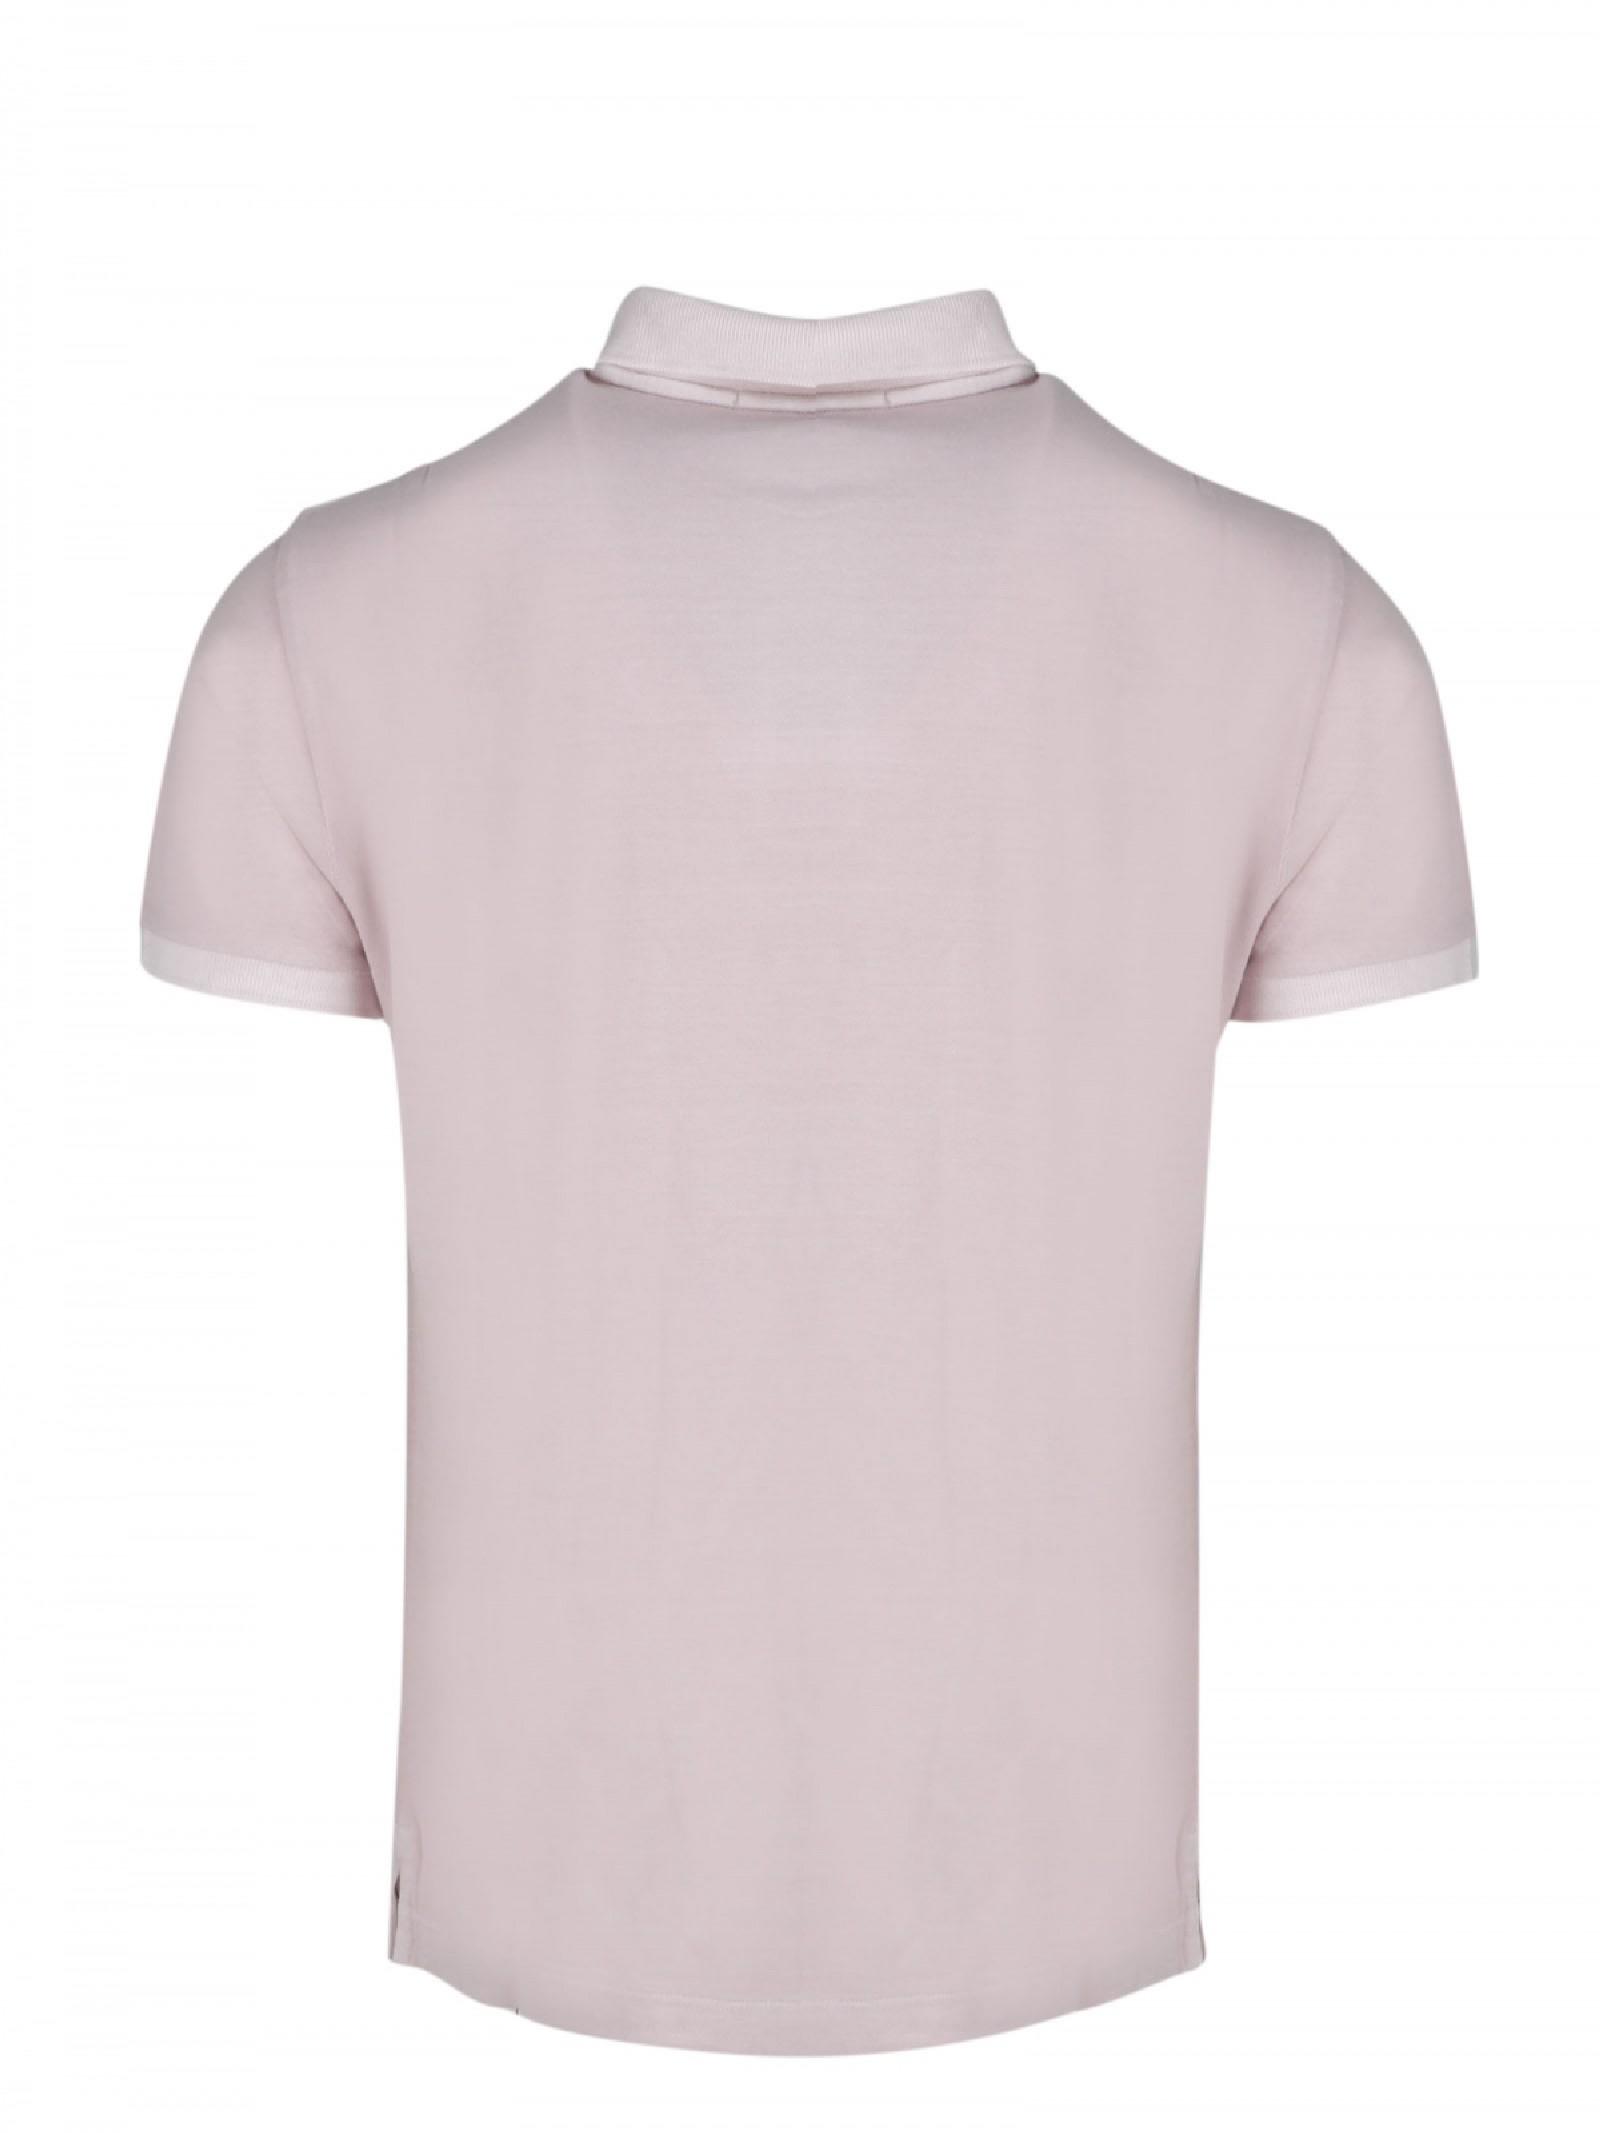 T-shirt girocollo STONE ISLAND | T-shirt | MO741522S67V0082